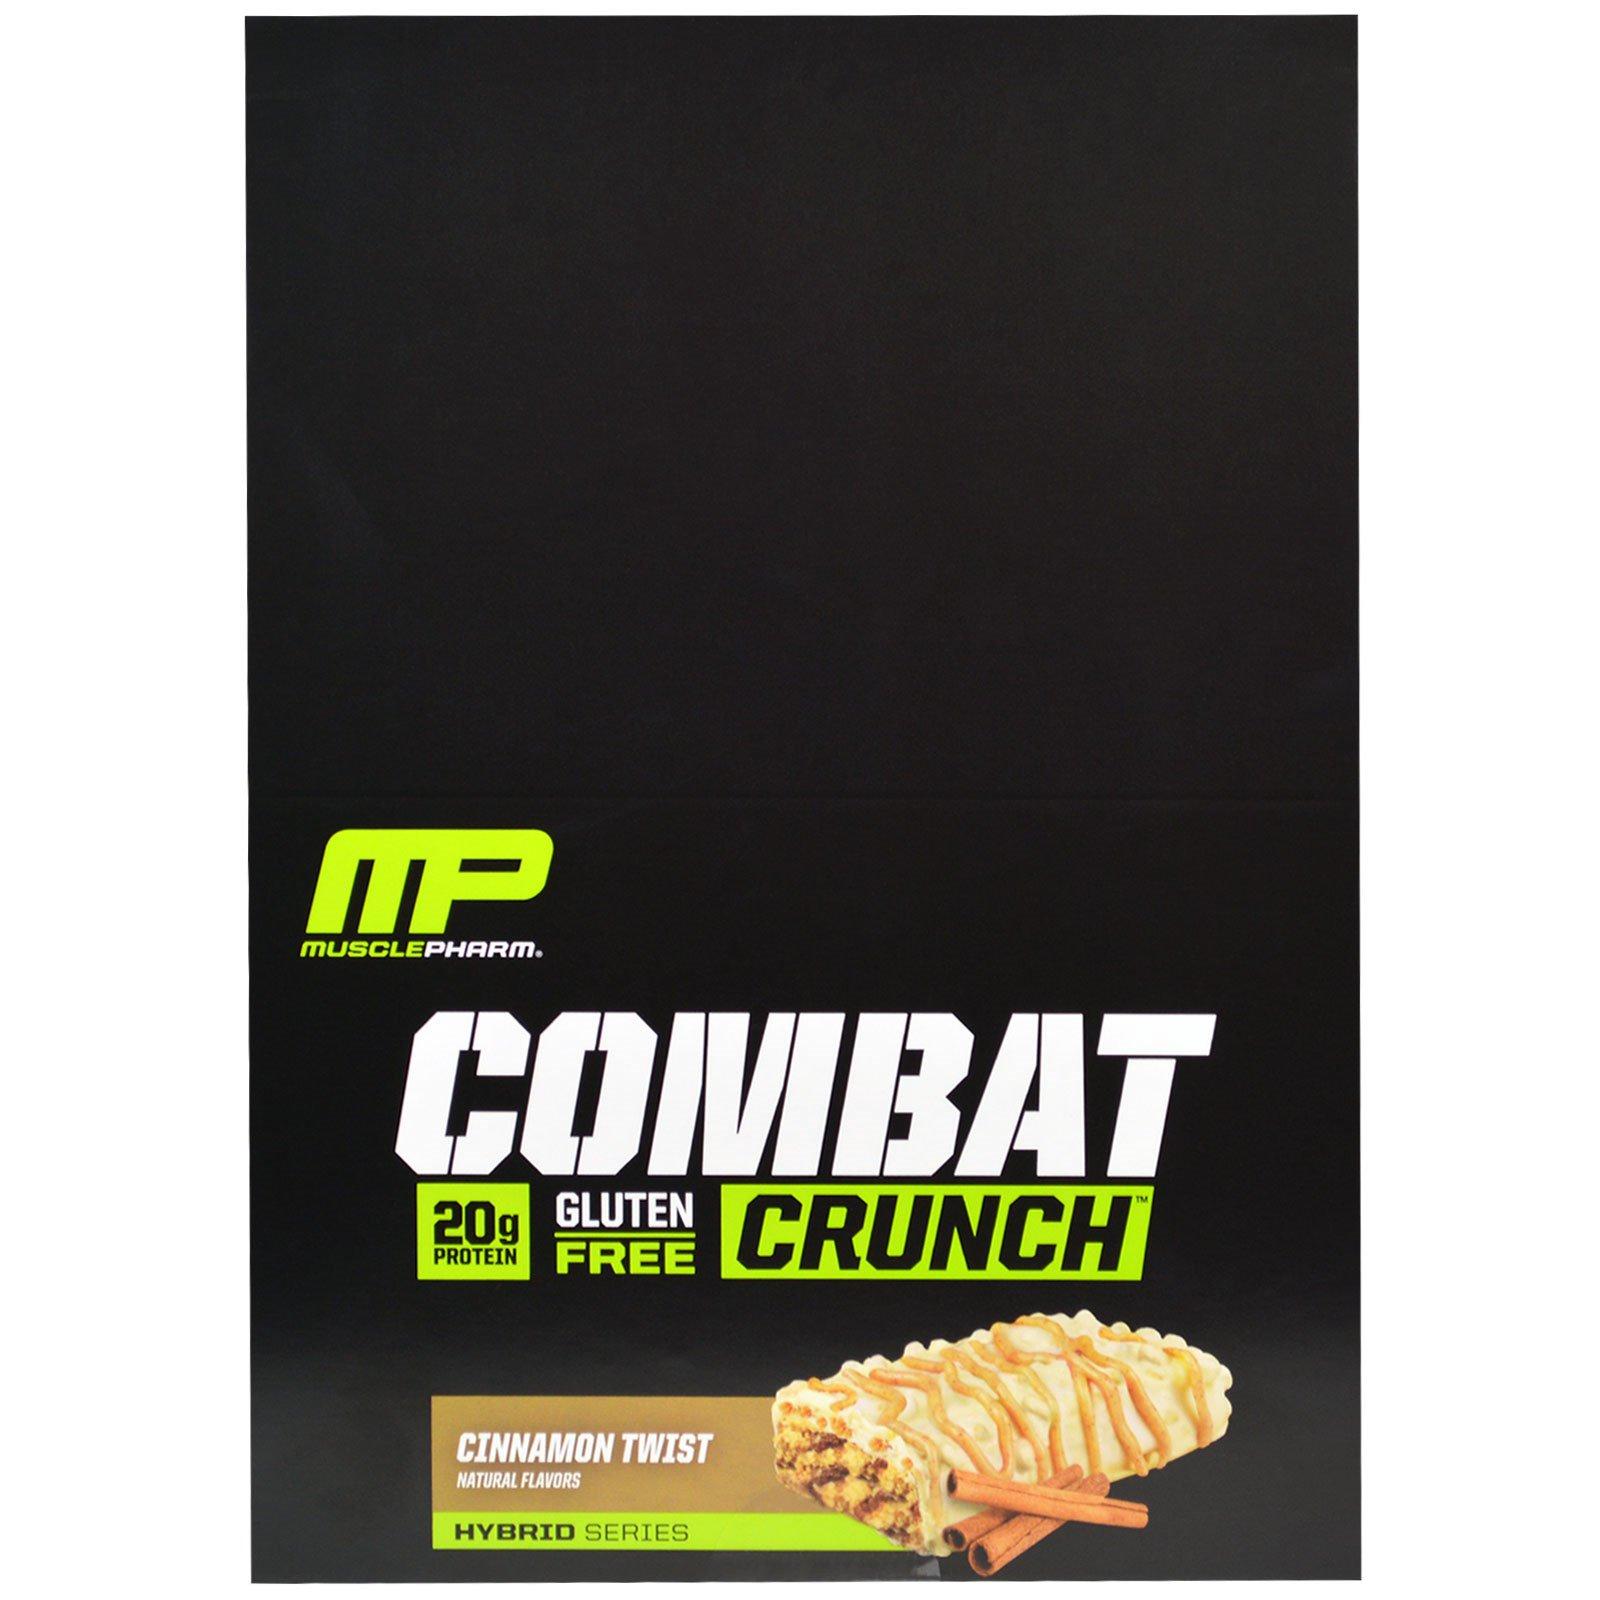 MusclePharm, Combat Crunch, корица, 12 батончиков, 63 г каждый